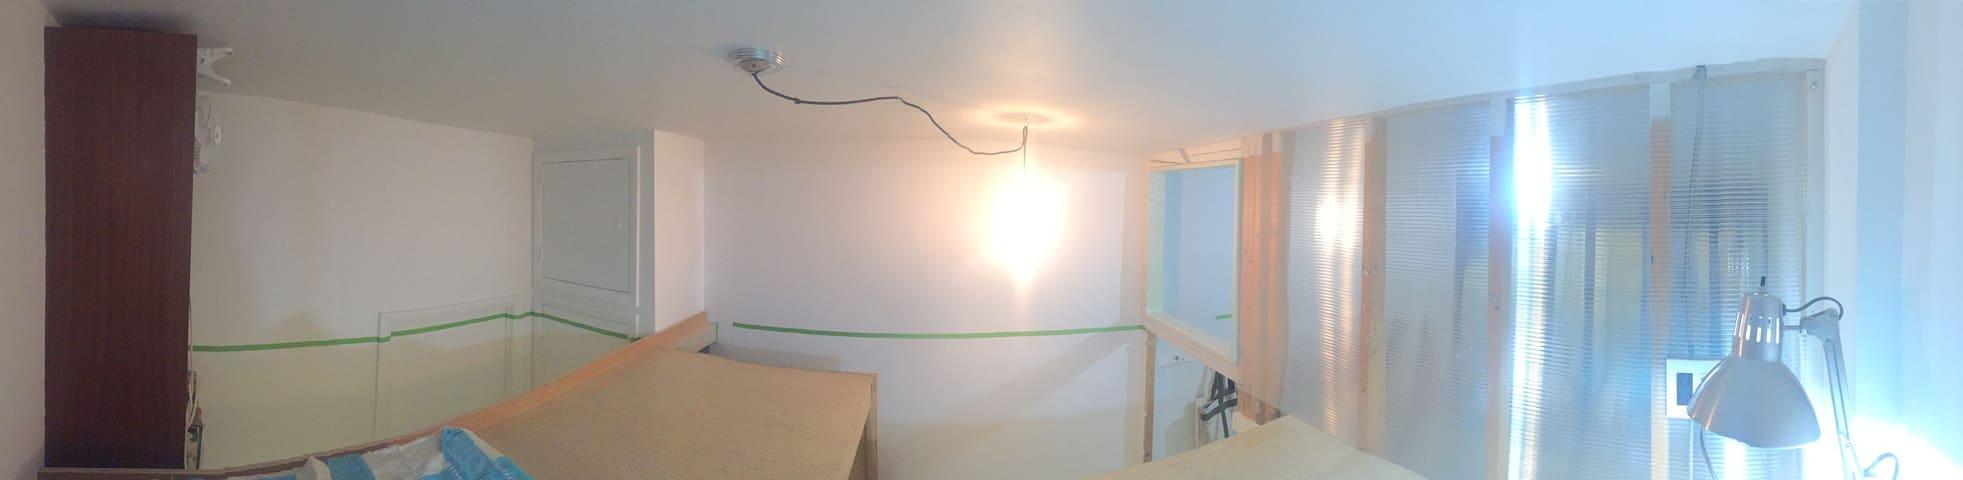 Semi private room with sleeping loft.